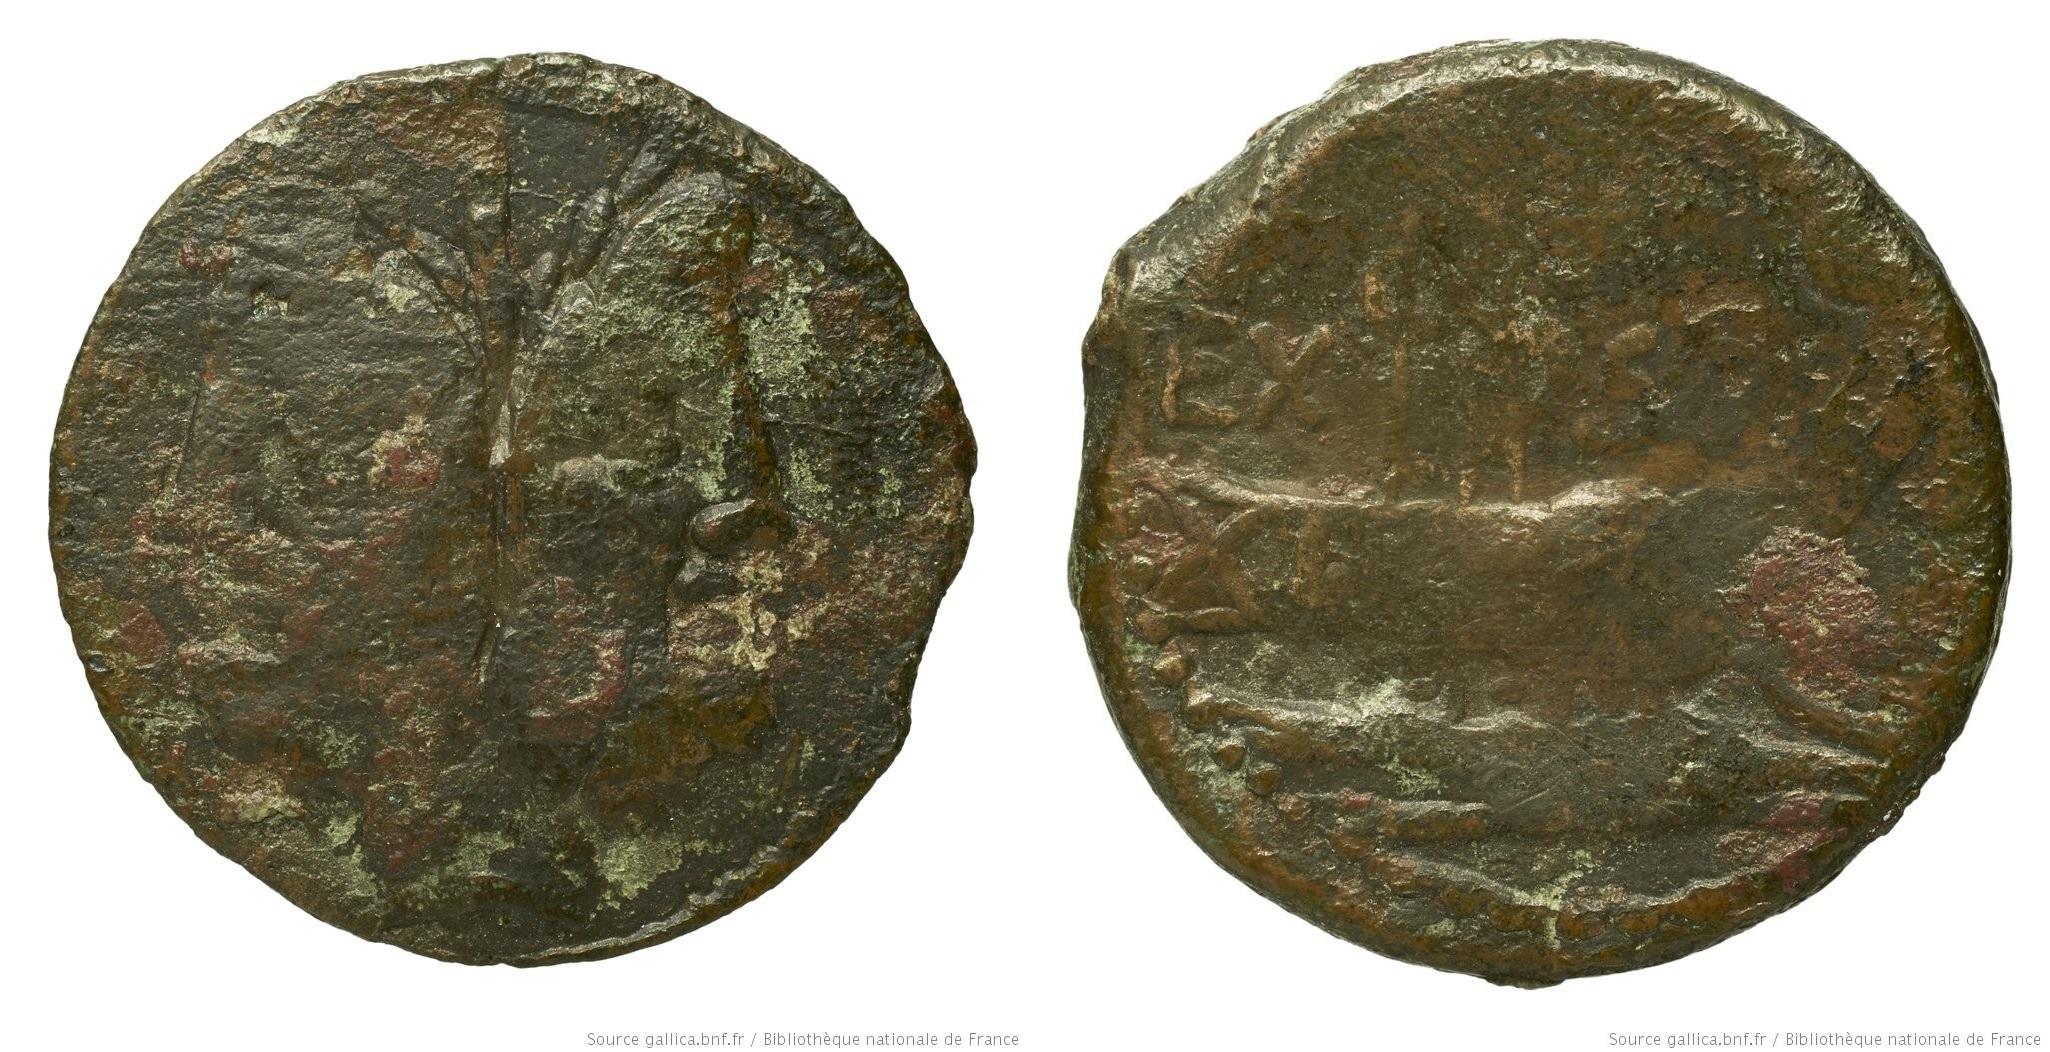 1274LI – As Licinia – Caius Licinius Macer